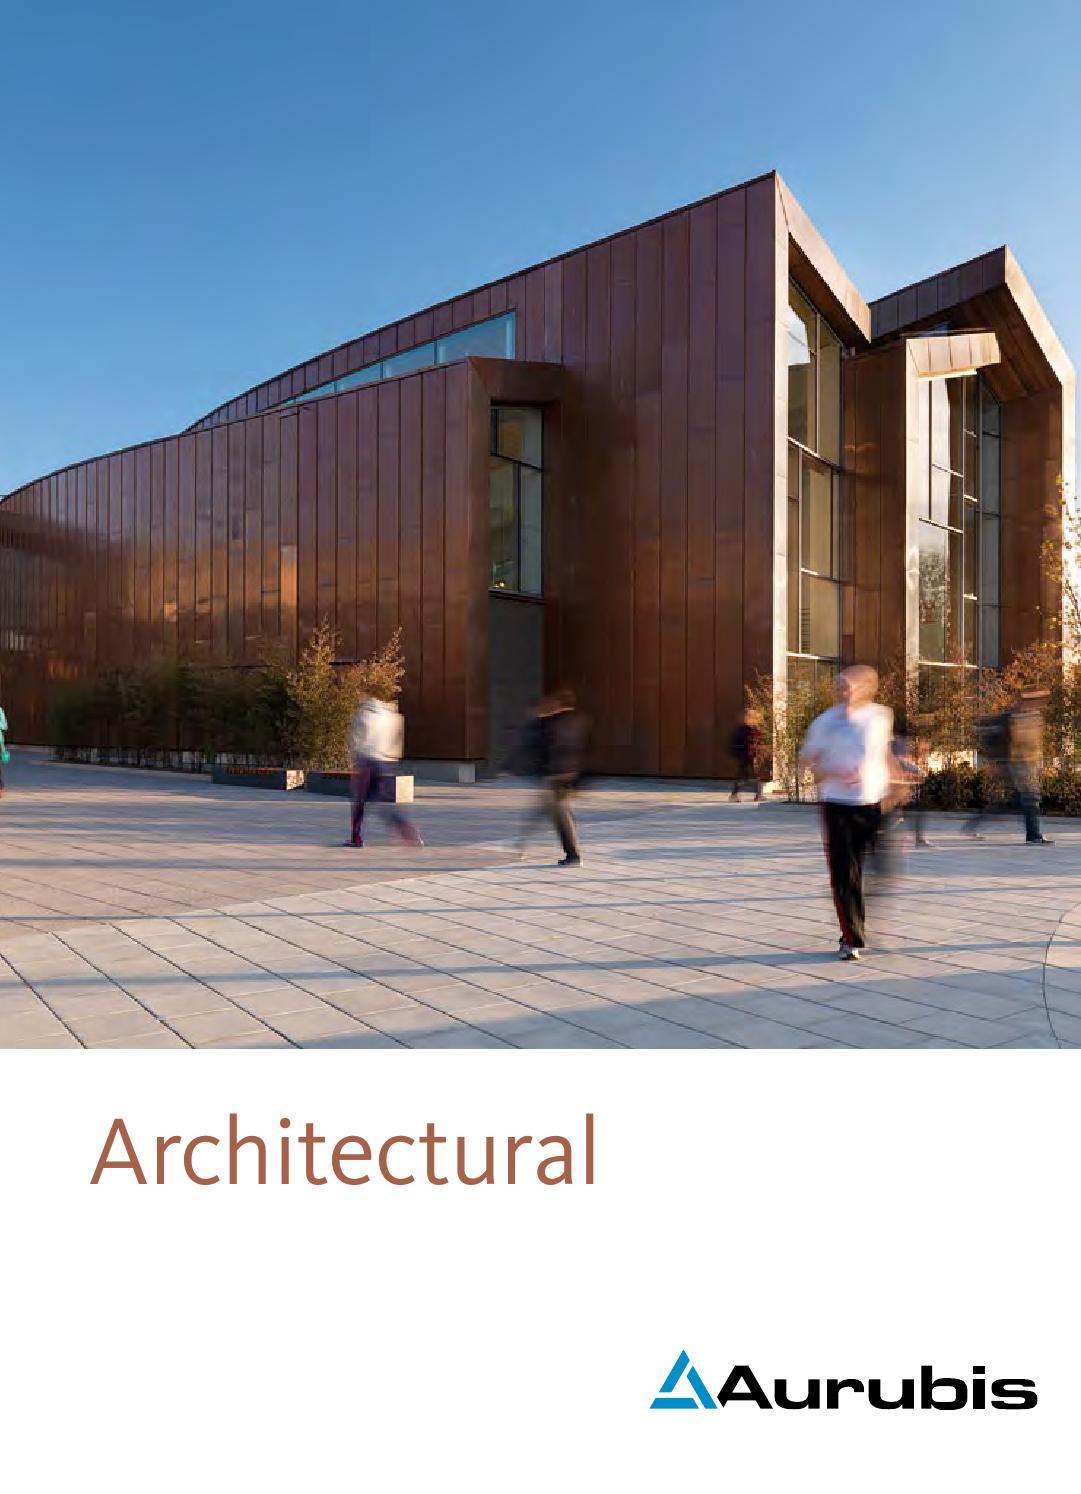 aurubis architectural brochure 2014 by aurubis finland oy. Black Bedroom Furniture Sets. Home Design Ideas